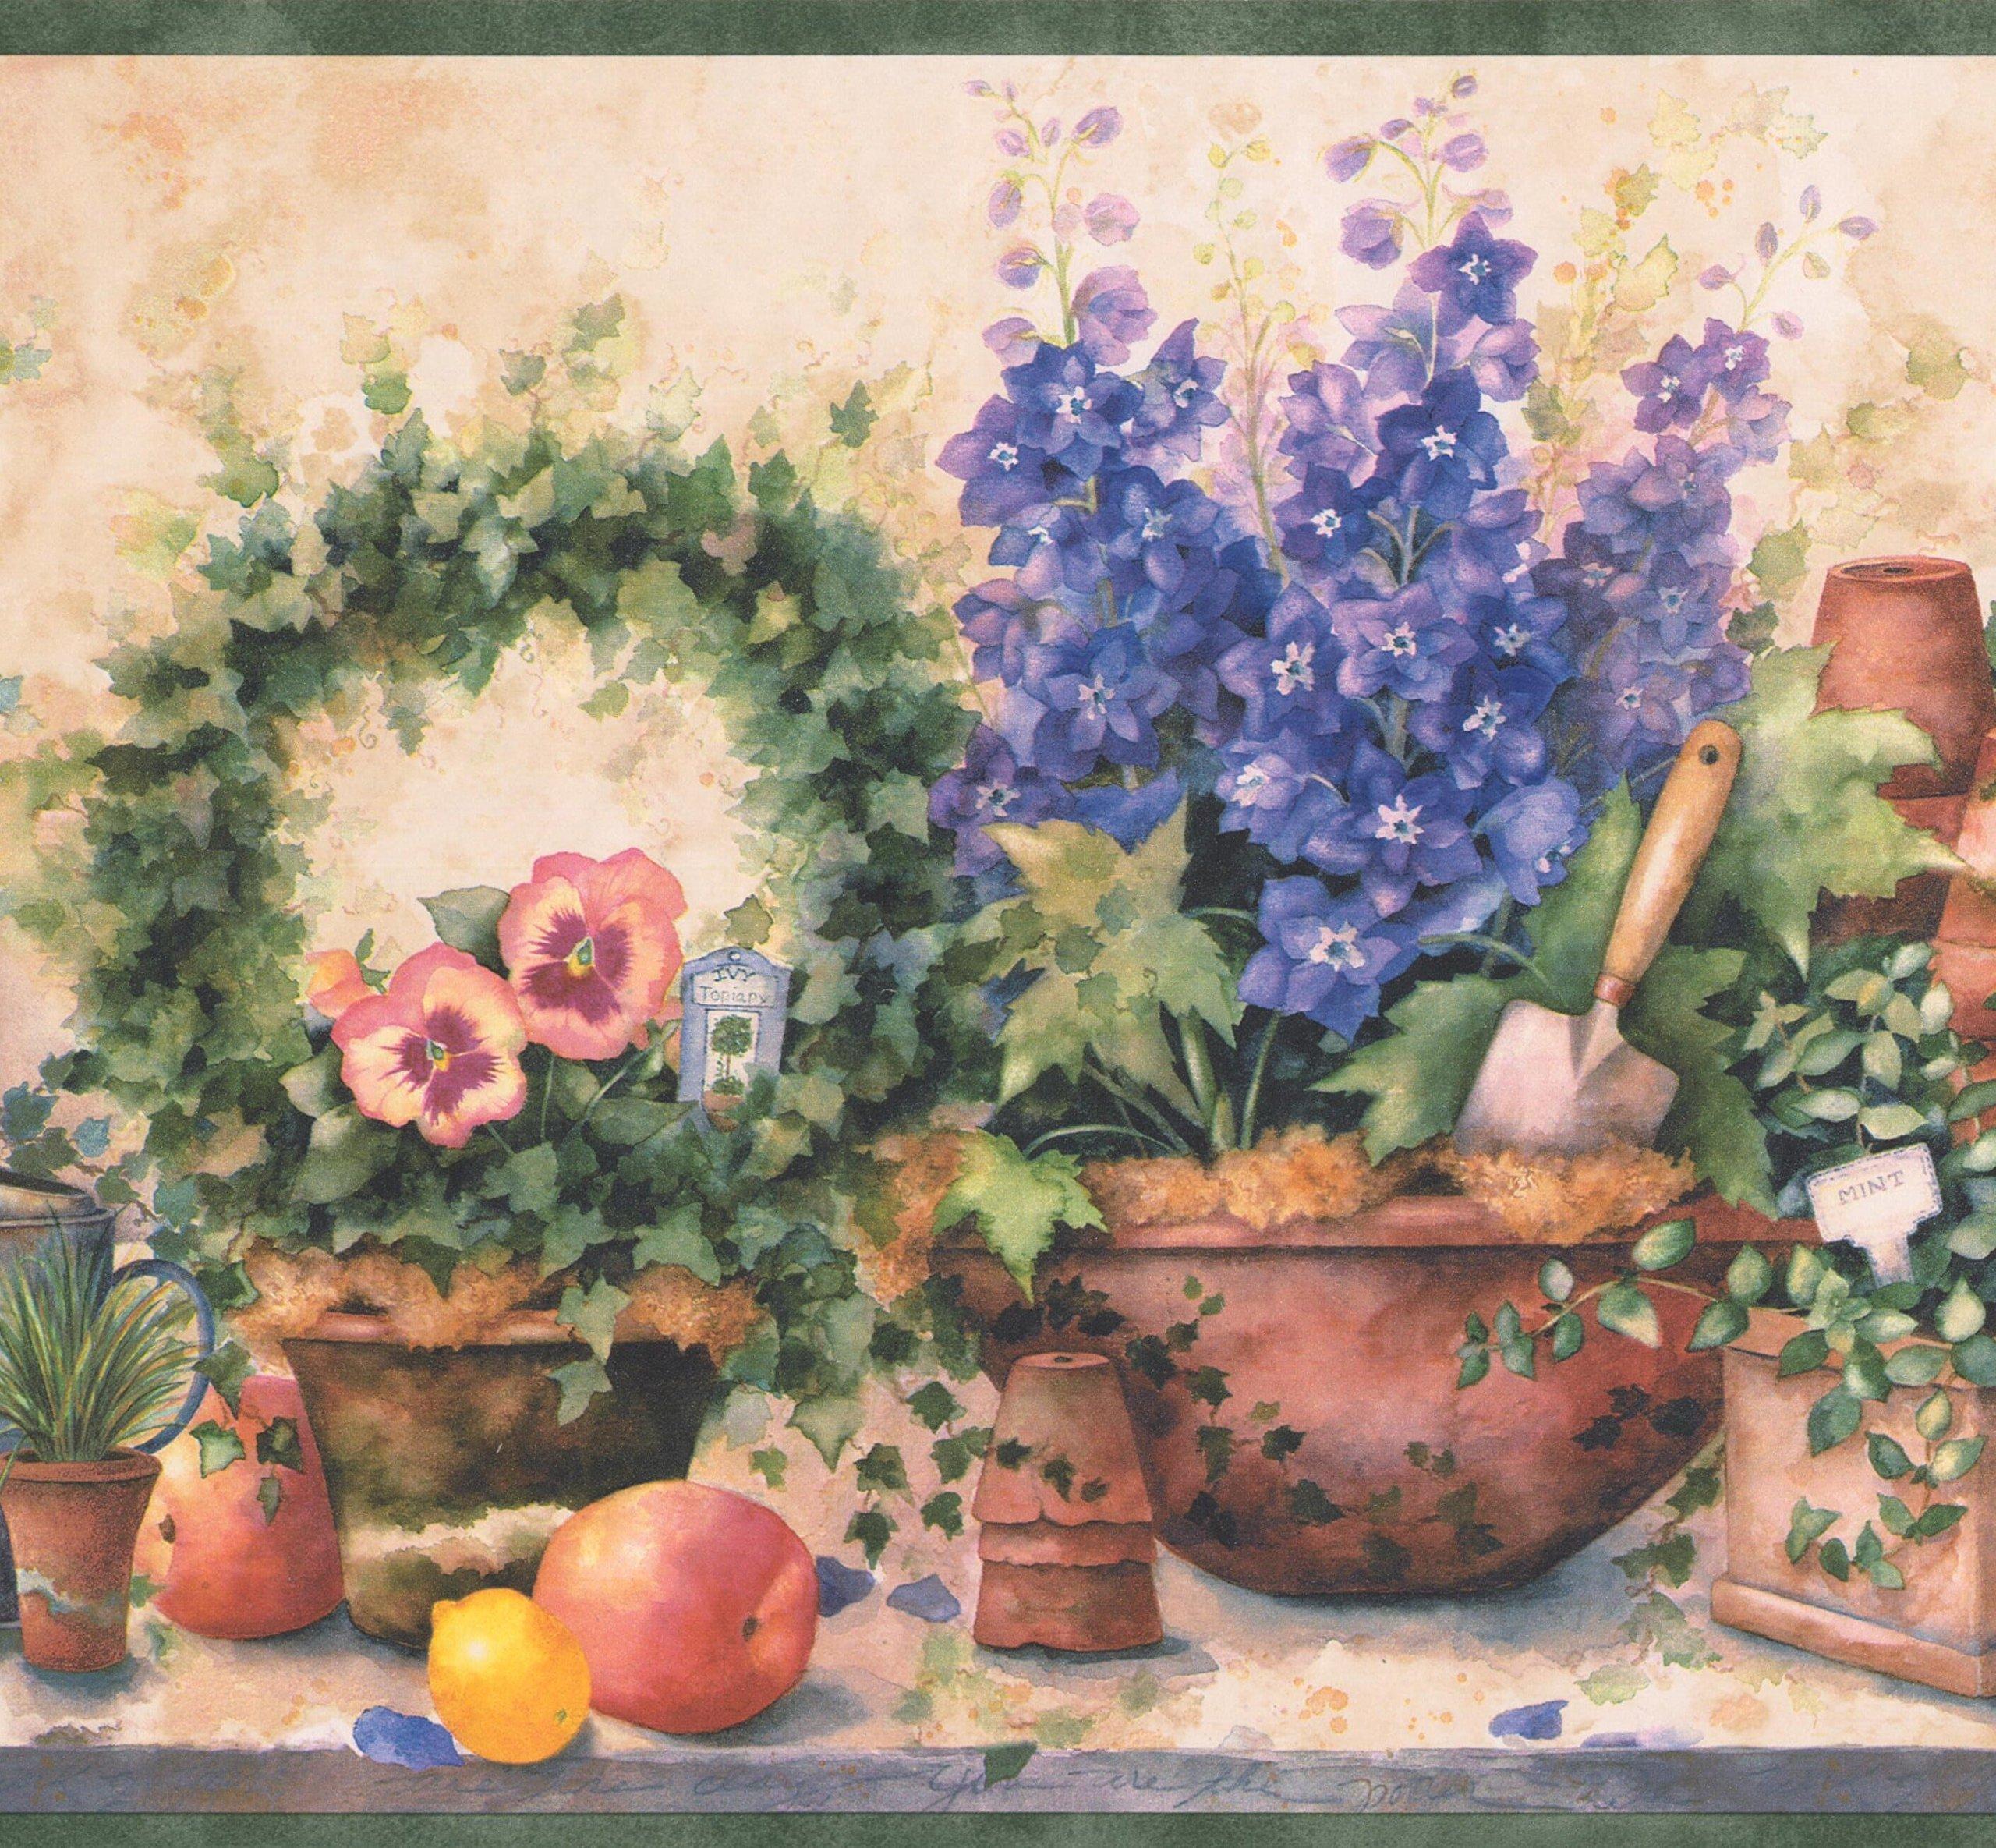 Purple Flowers in Pots Fruits Gardening Tools Farmhouse Wallpaper Border Retro Design, Roll 15' x 9''